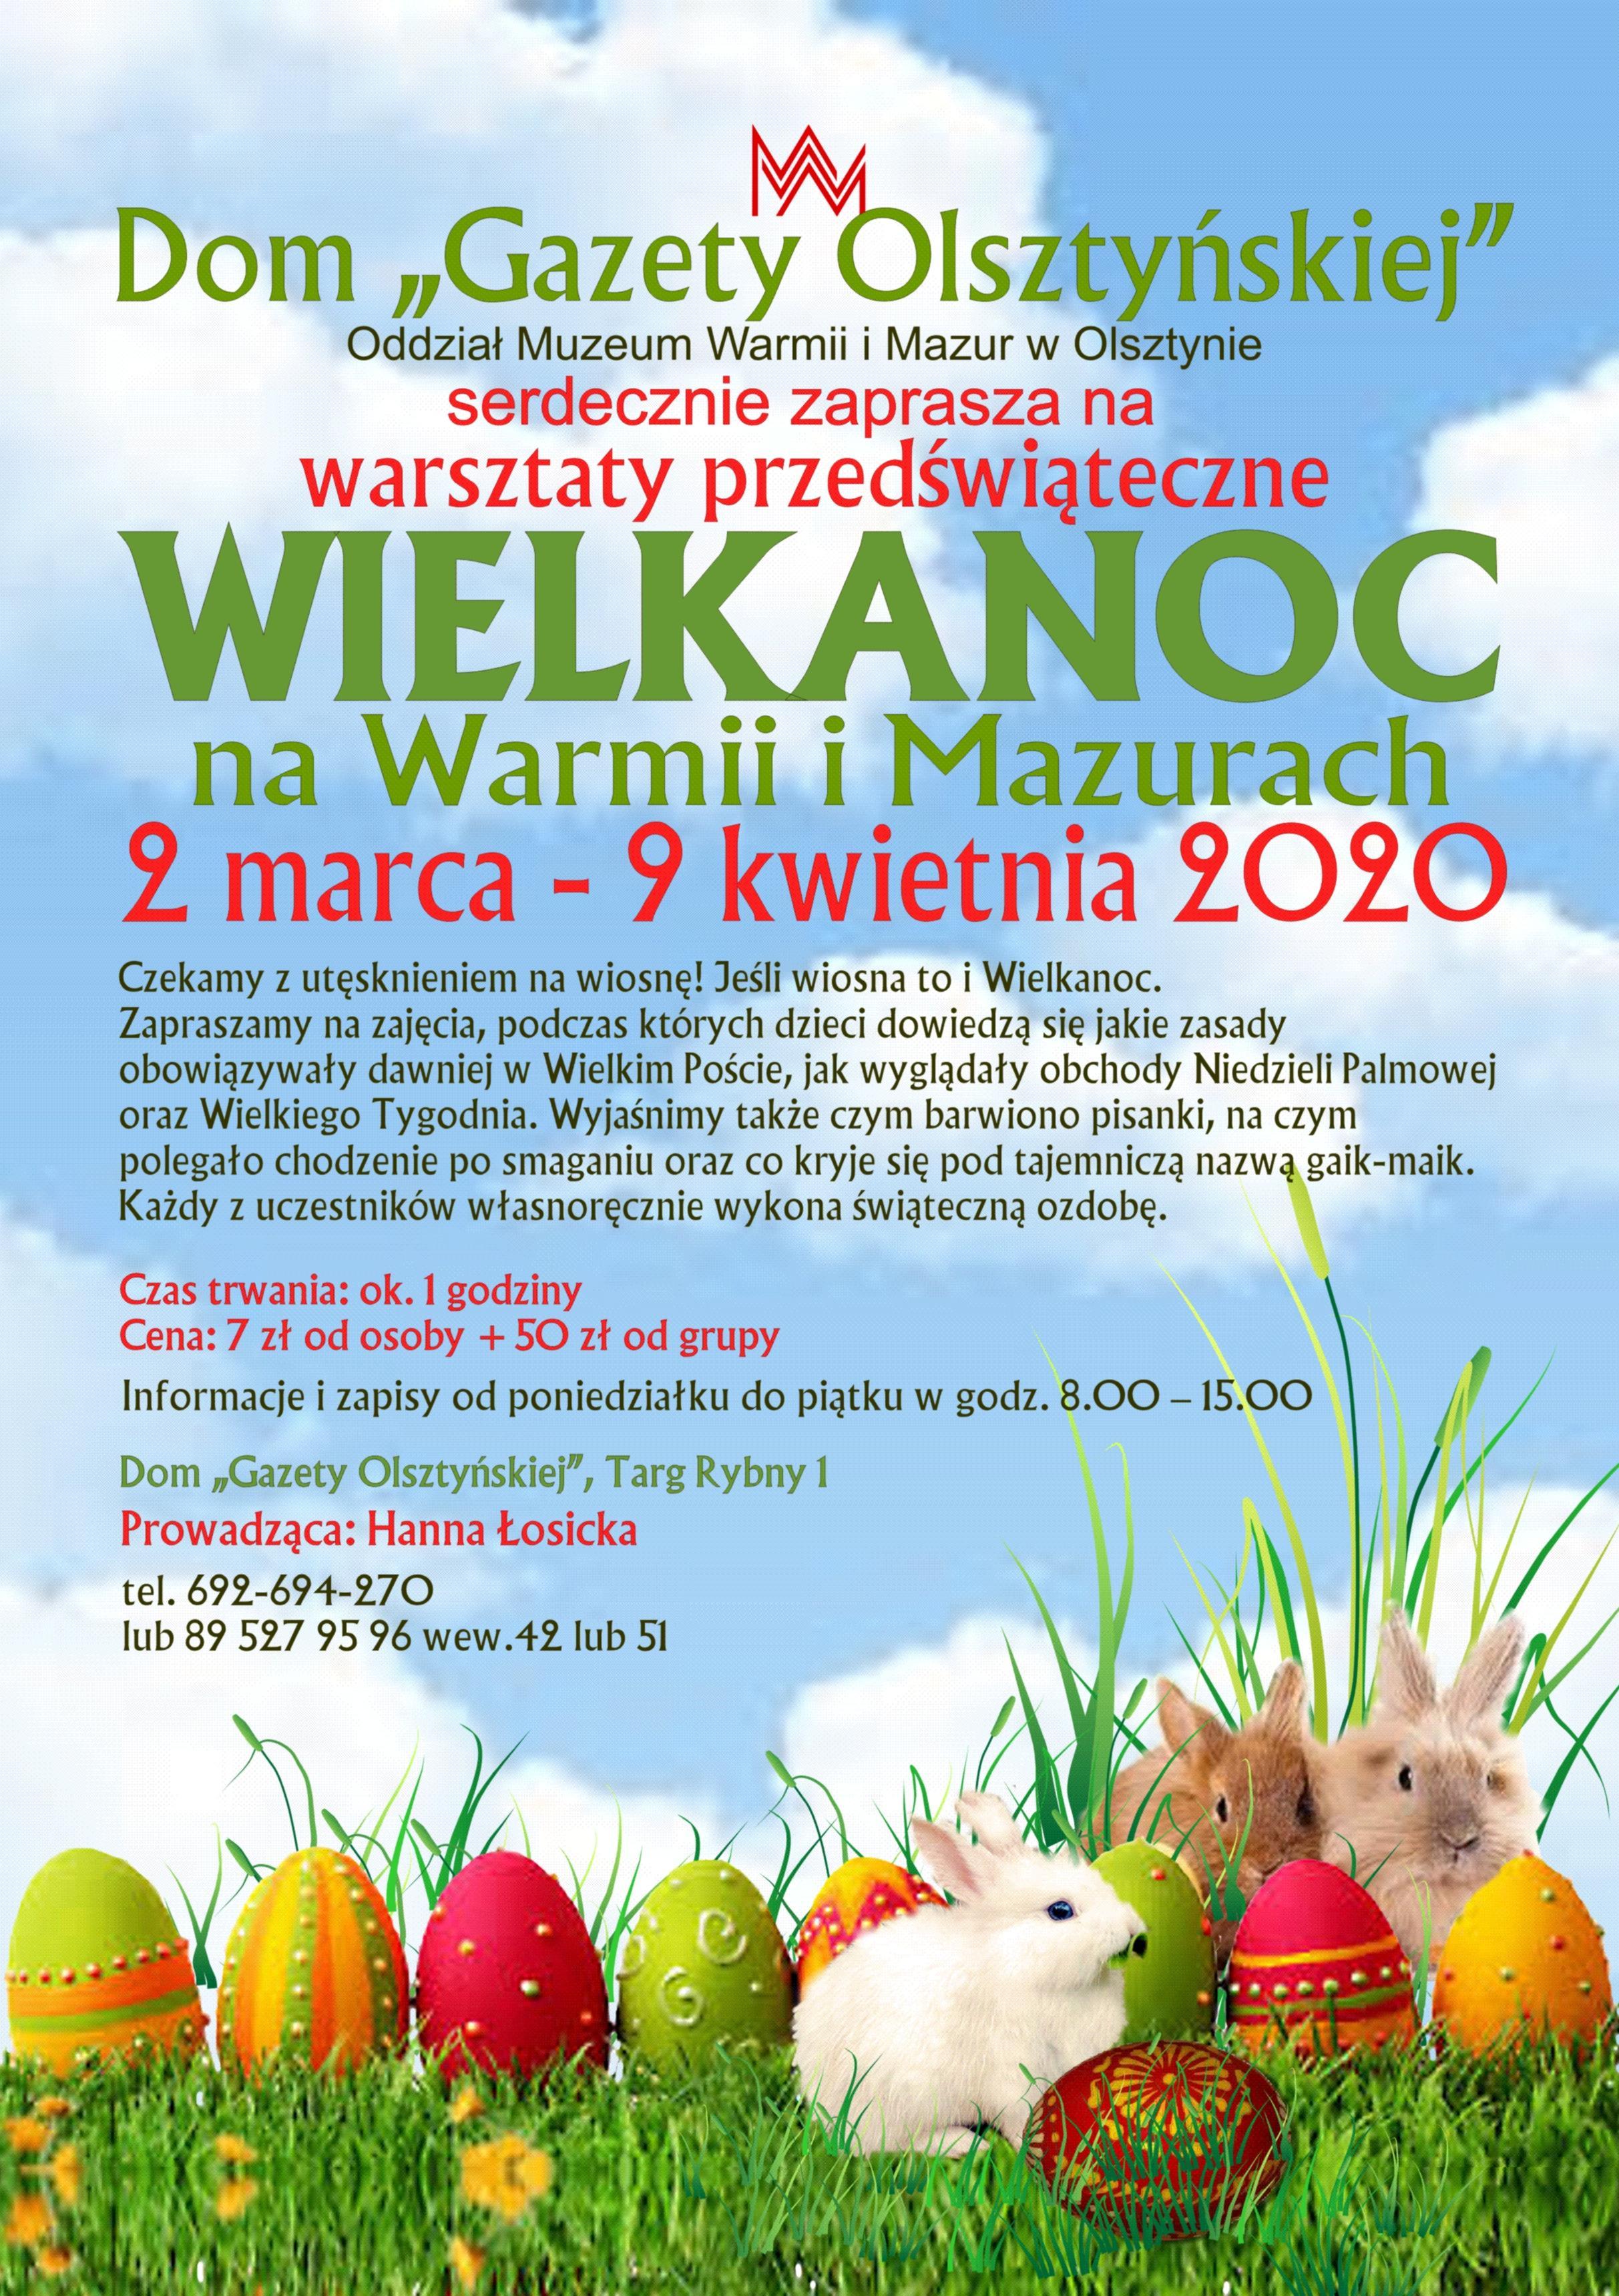 https://m.wmwm.pl/2020/03/orig/ulotka-wielanoc-2020-dgo-6631.jpg